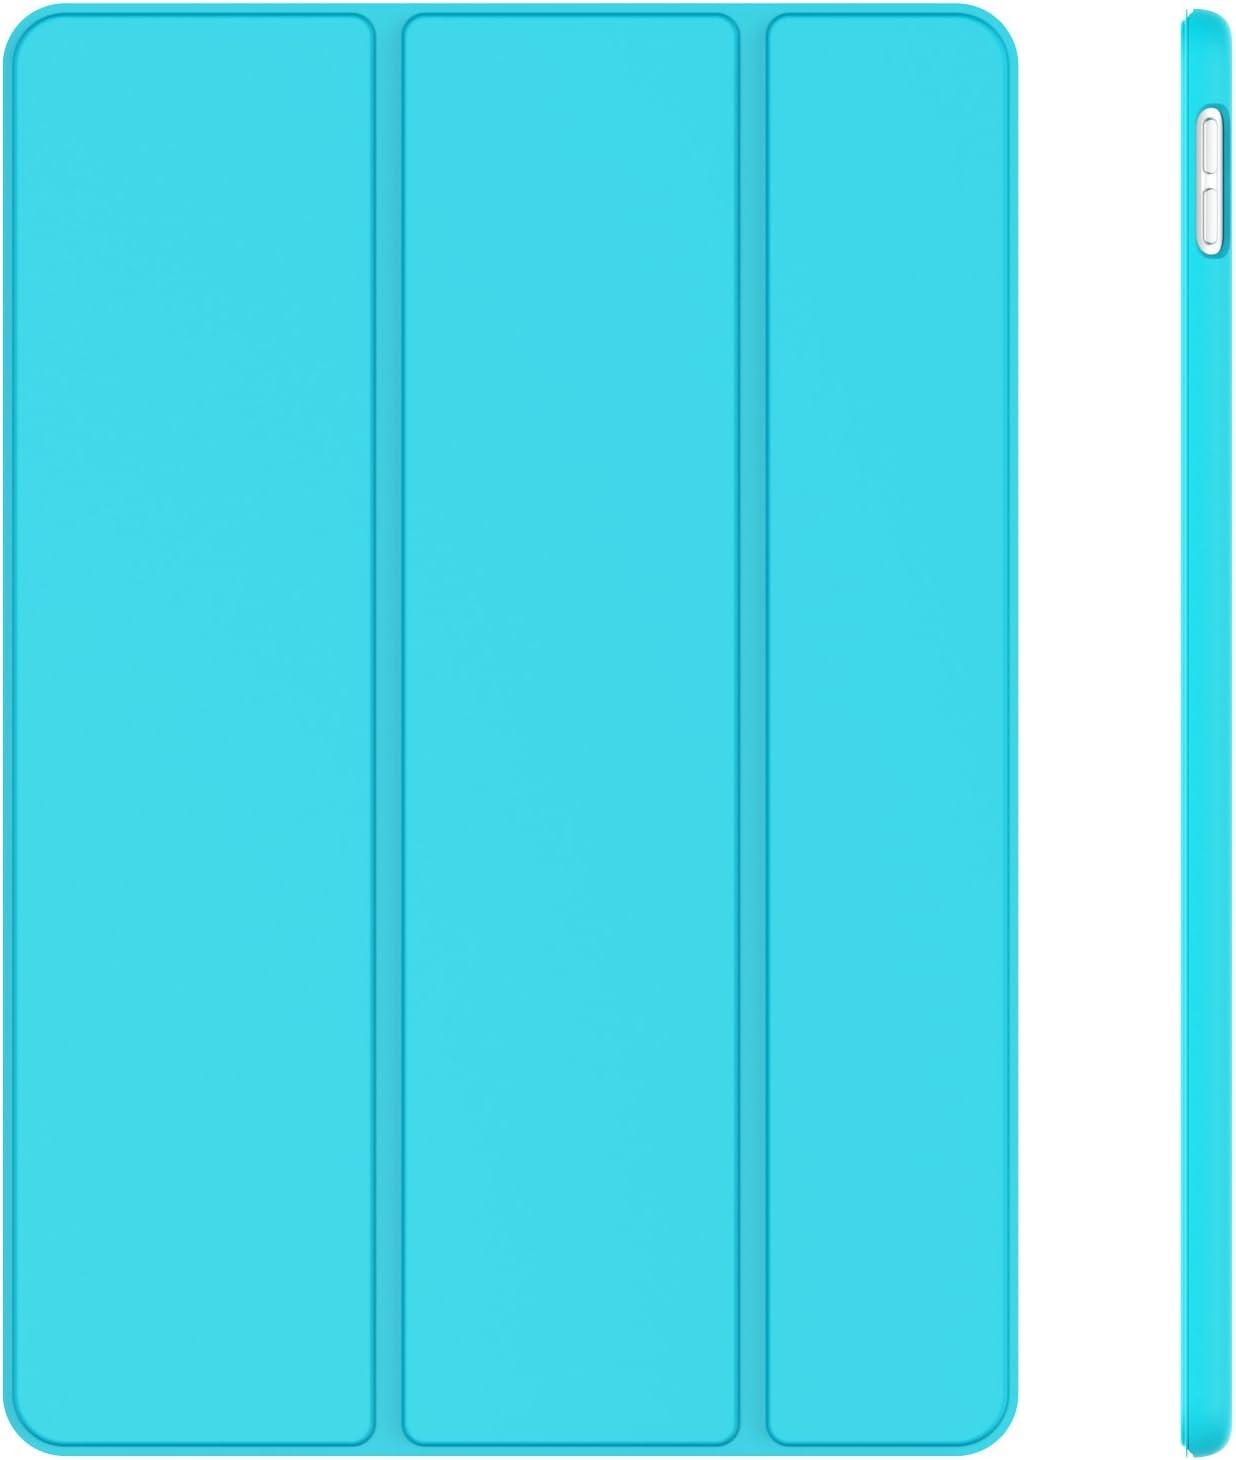 JETech Case for iPad Air 3 (10.5-inch 2019) and iPad Pro 10.5, Auto Wake/Sleep, Blue